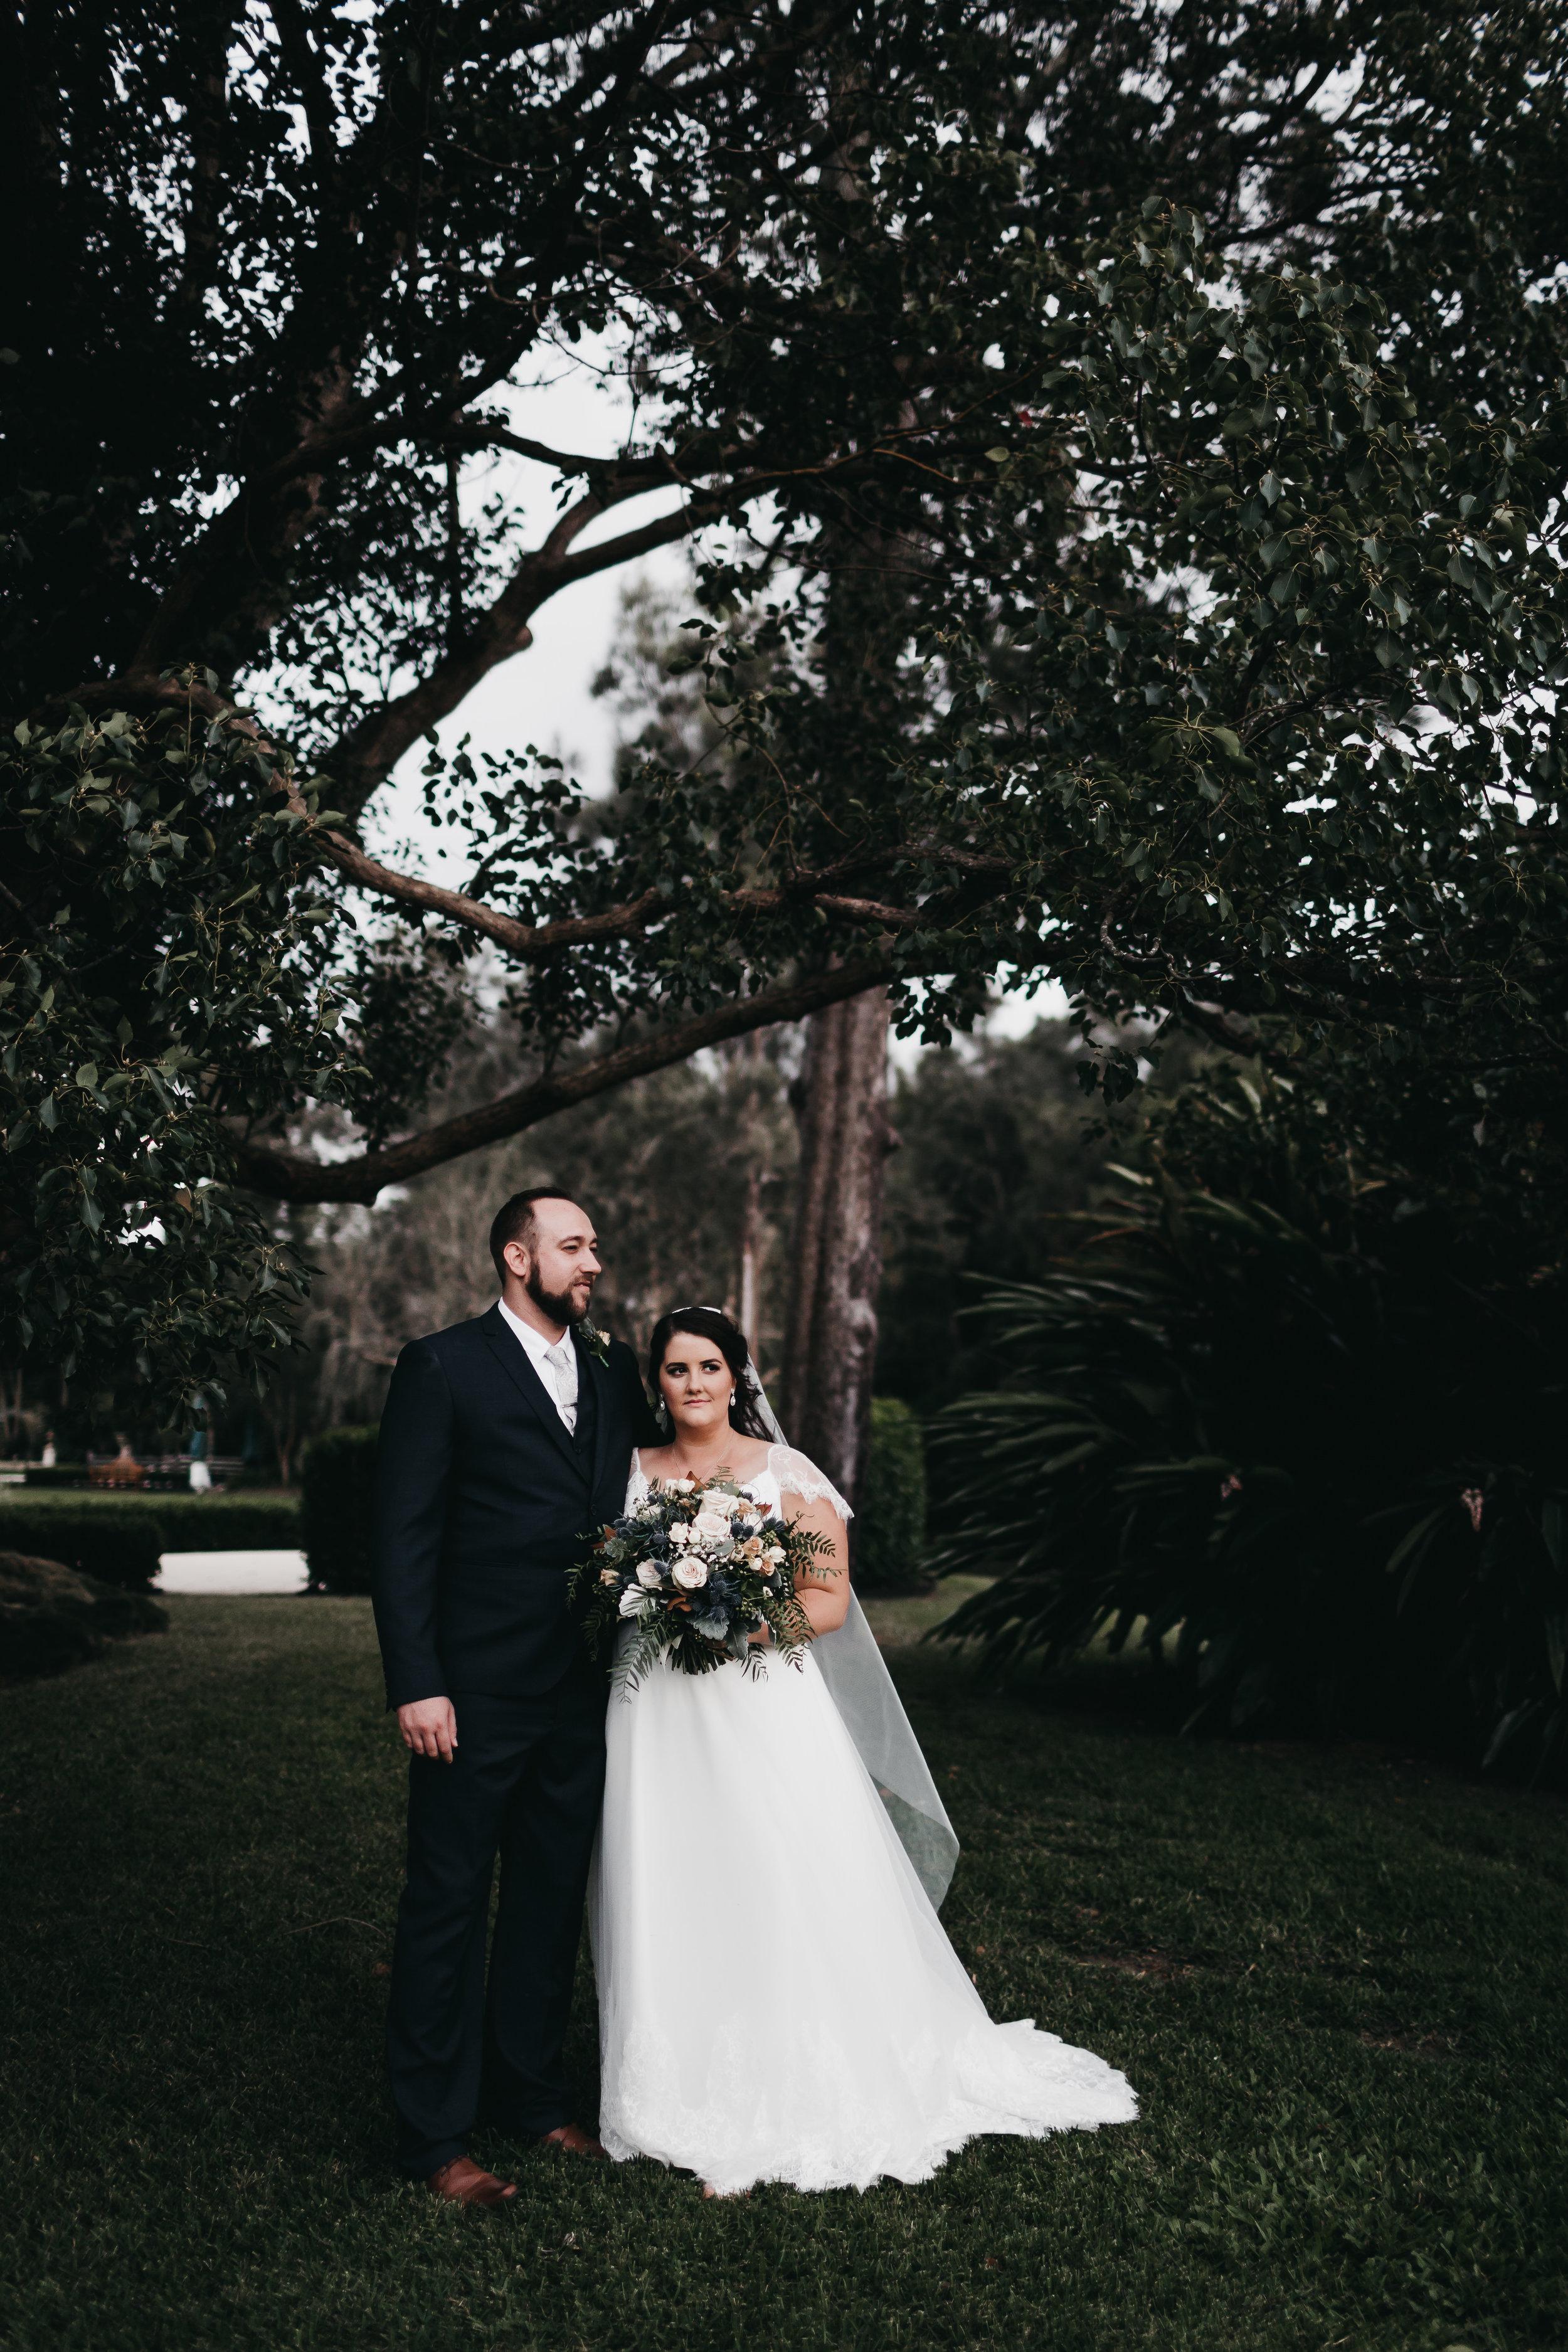 bondwedding-567.jpg